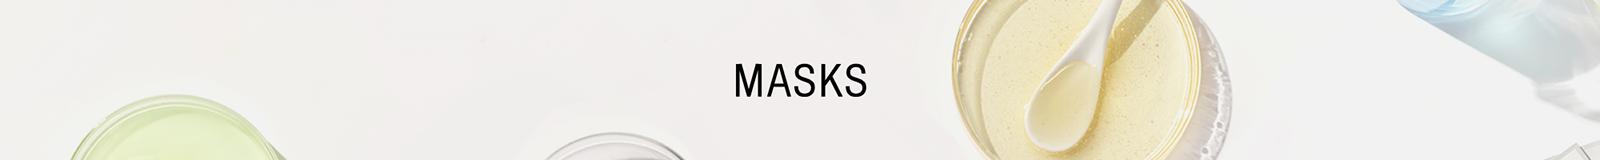 Innisfree - Mask - Title